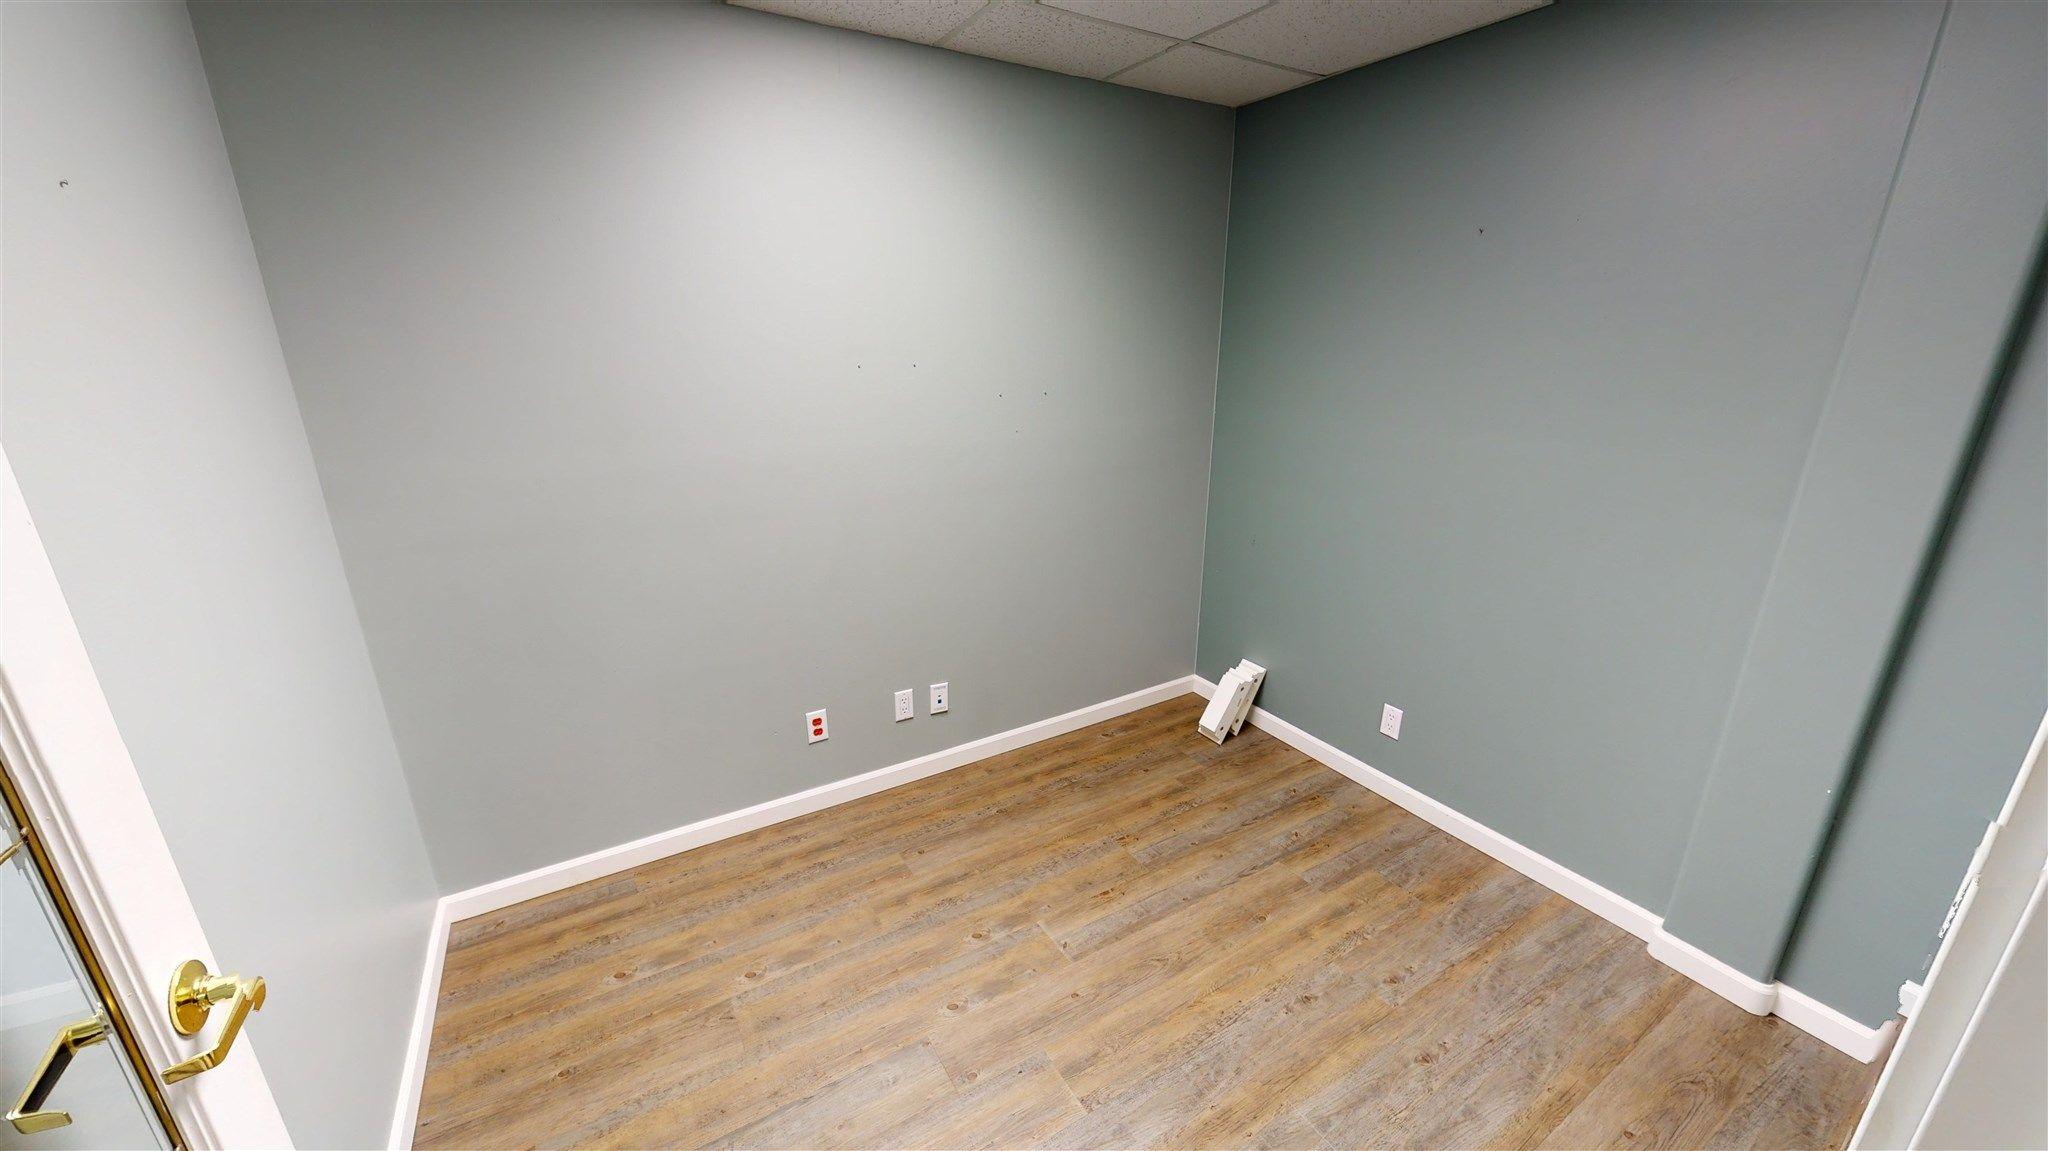 Photo 14: Photos: 10067 100 Avenue in Fort St. John: Fort St. John - City NW Office for sale (Fort St. John (Zone 60))  : MLS®# C8039097